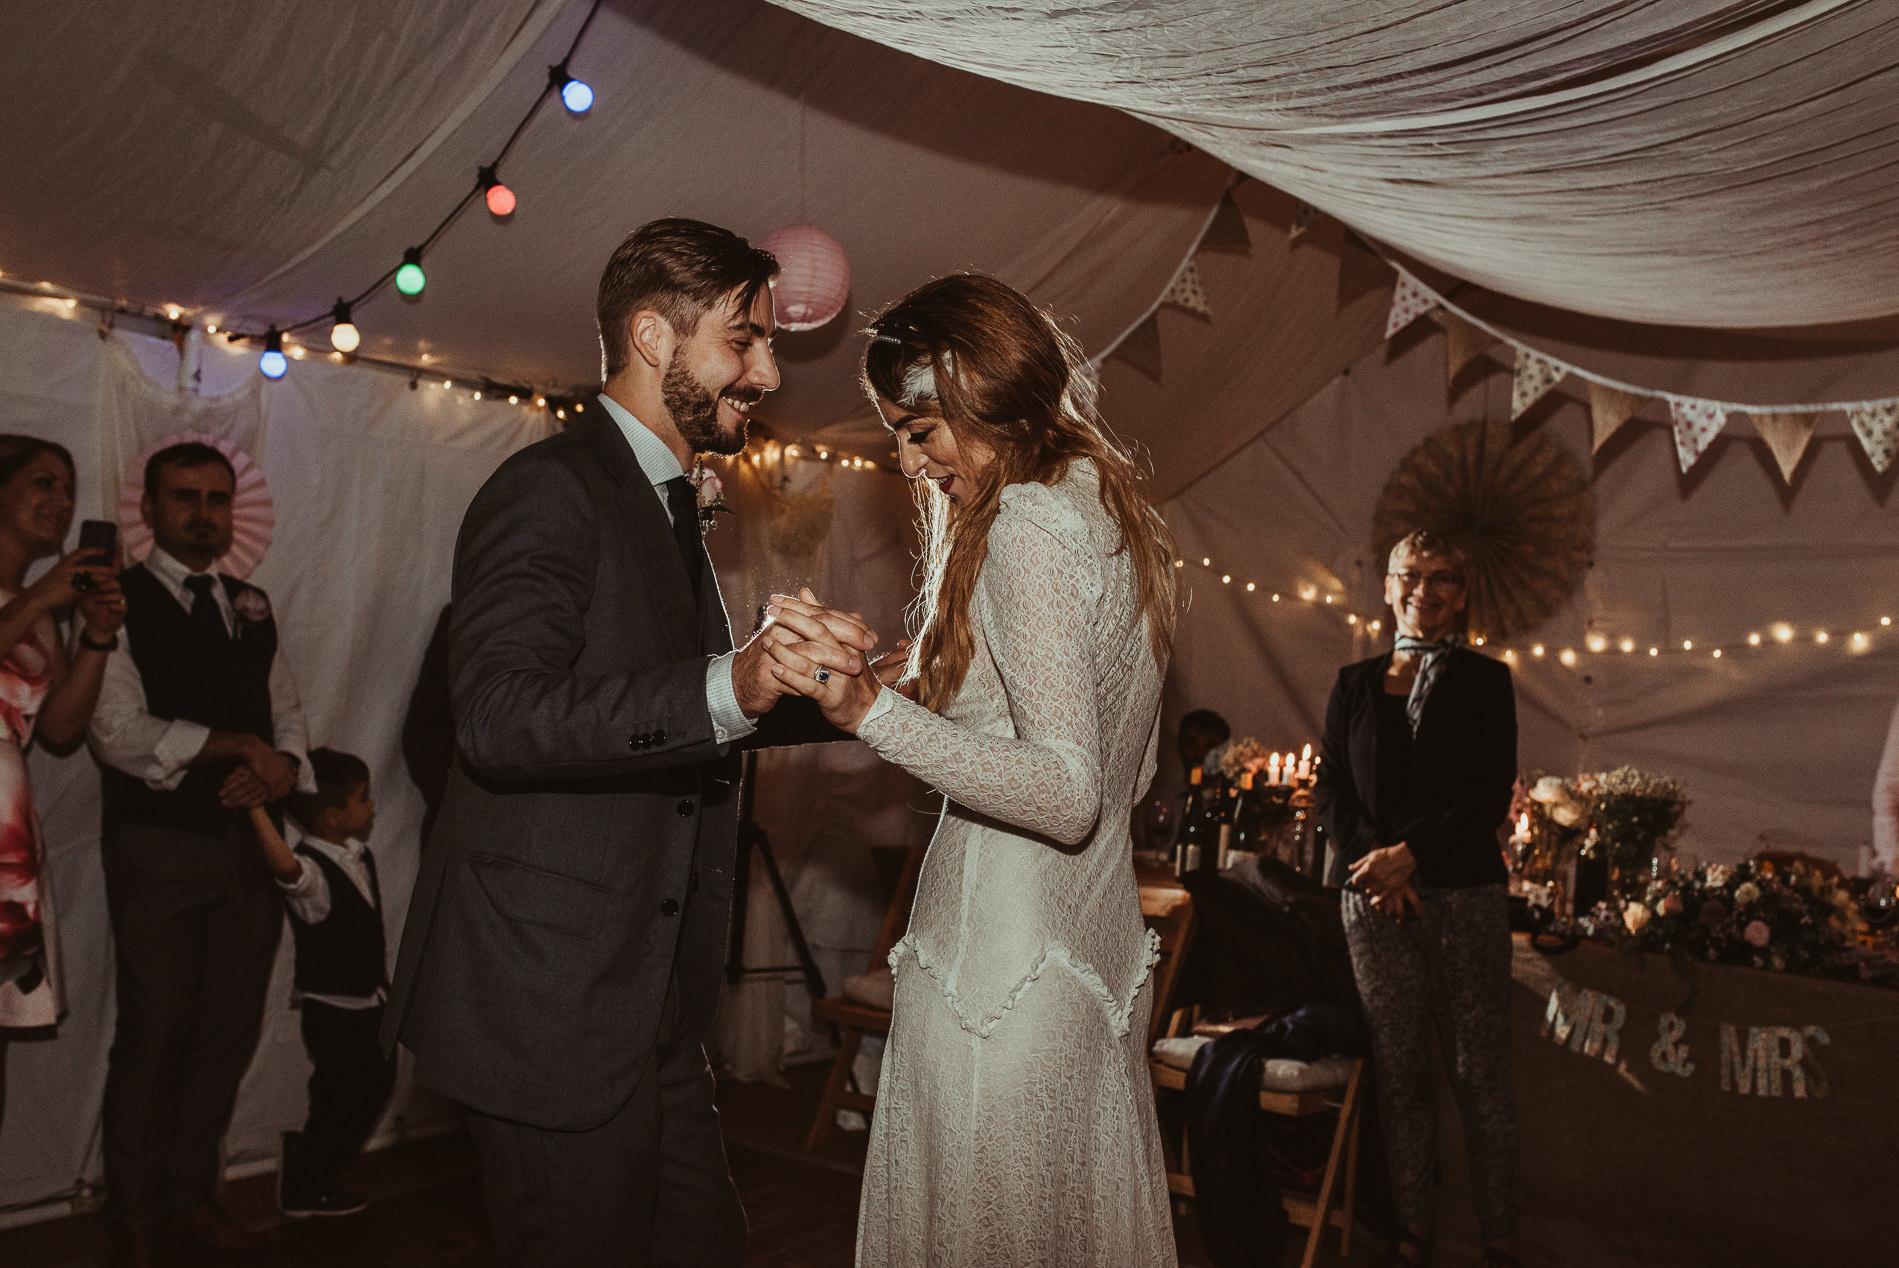 bohemian_wedding_lawshall_church_garden134